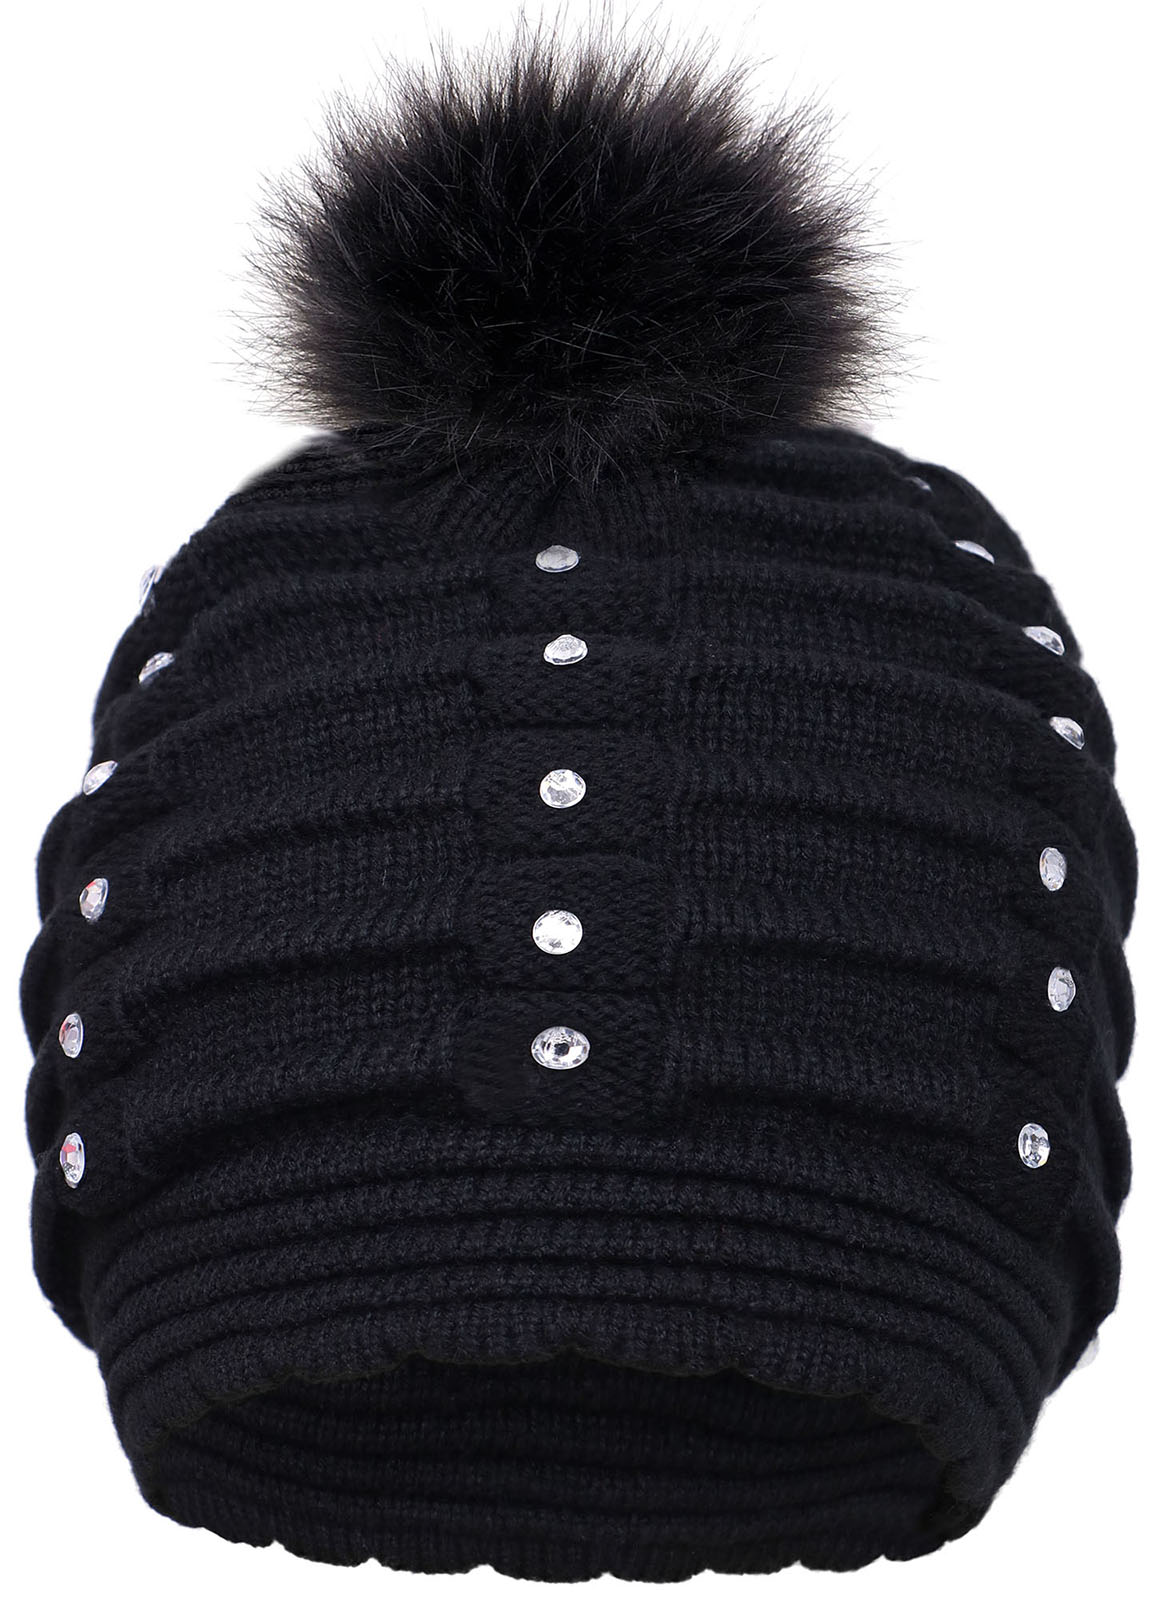 Women Winter Warm Knitted Faux Fur Pom Pom Beanie Hat - Tanga 2d8026e288